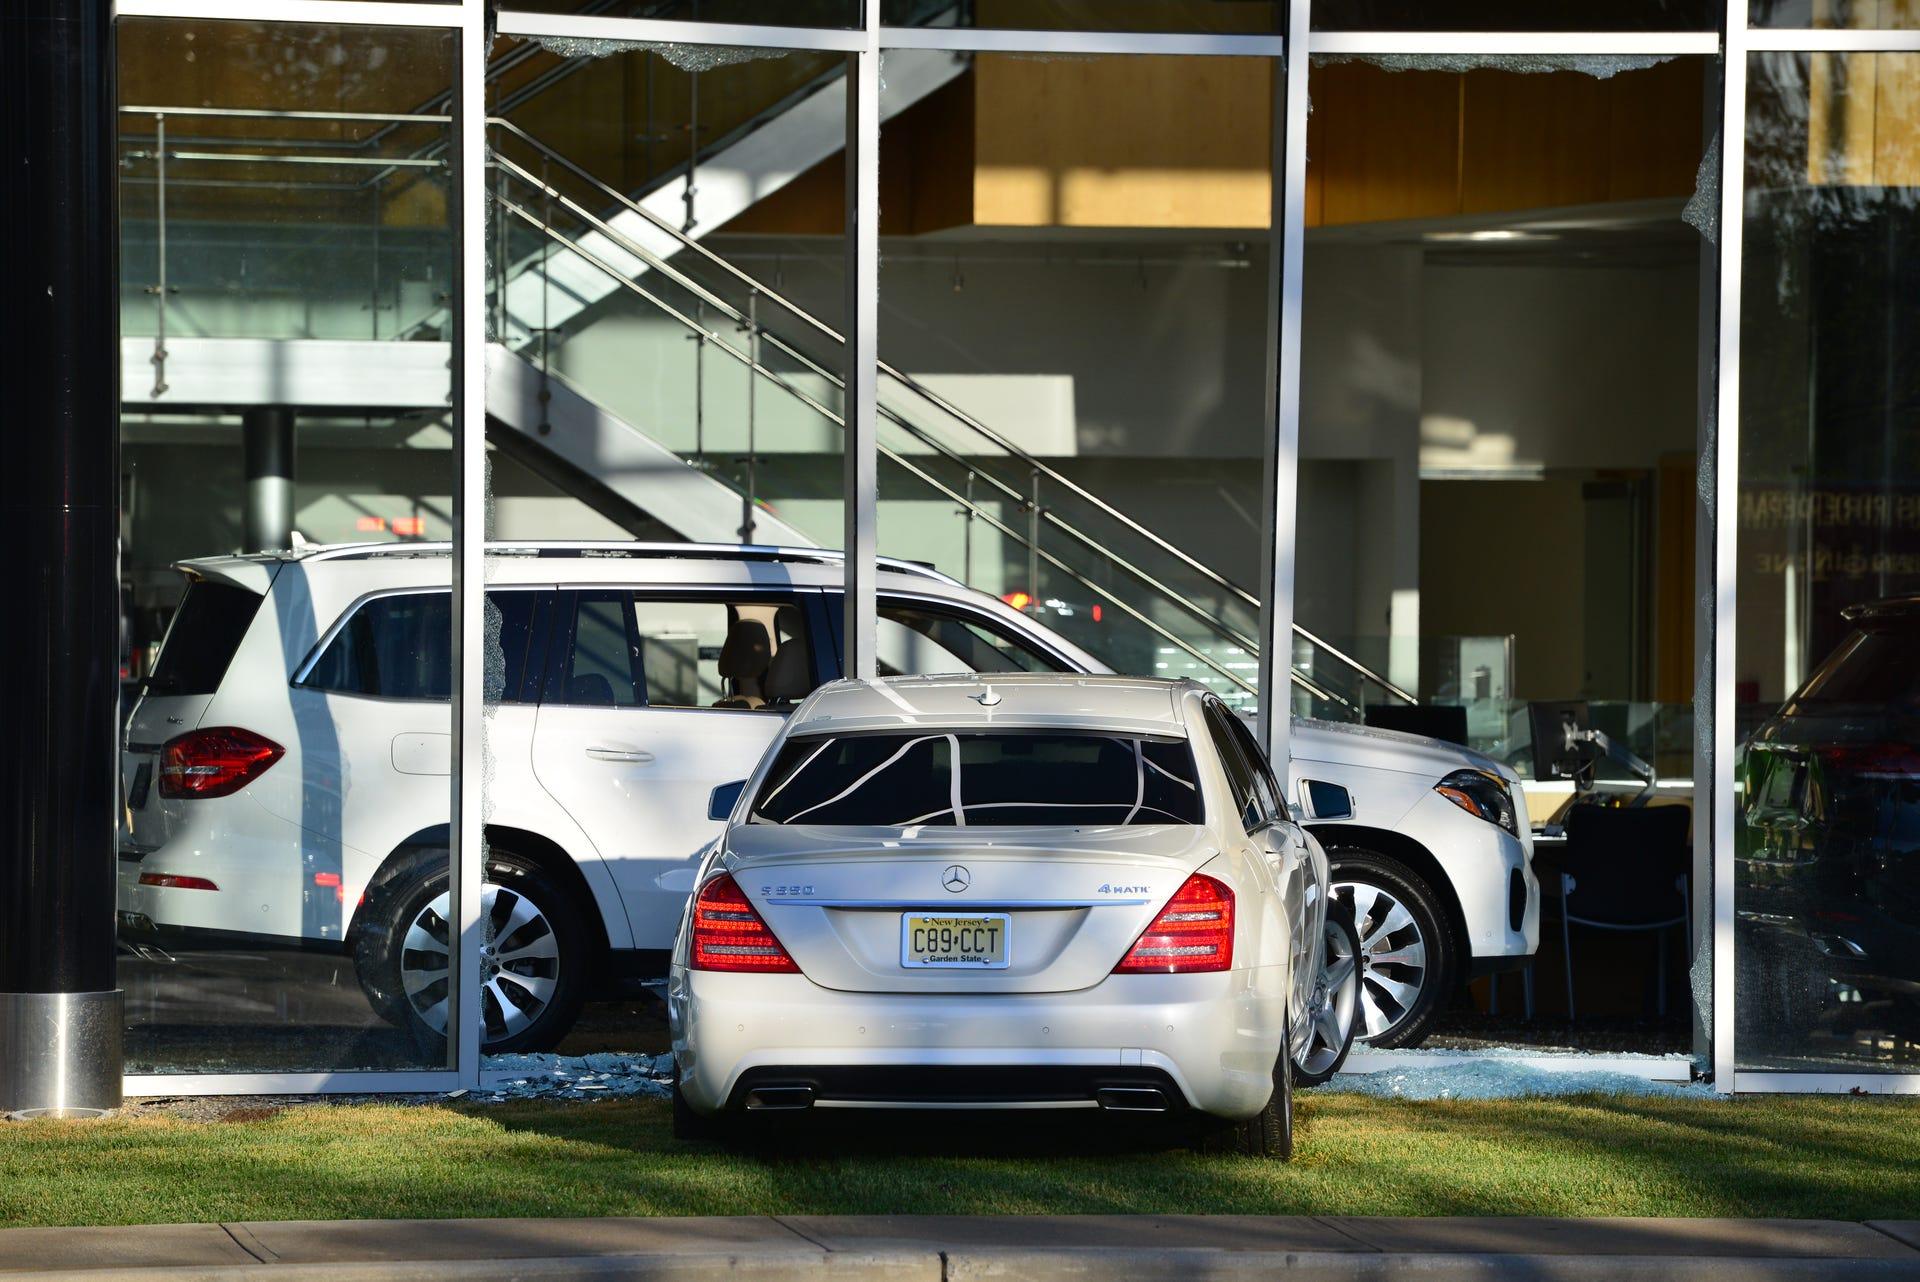 Mercedes Benz Dealers In Nj >> Car Strikes Window At Mercedes Benz Dealership In Paramus